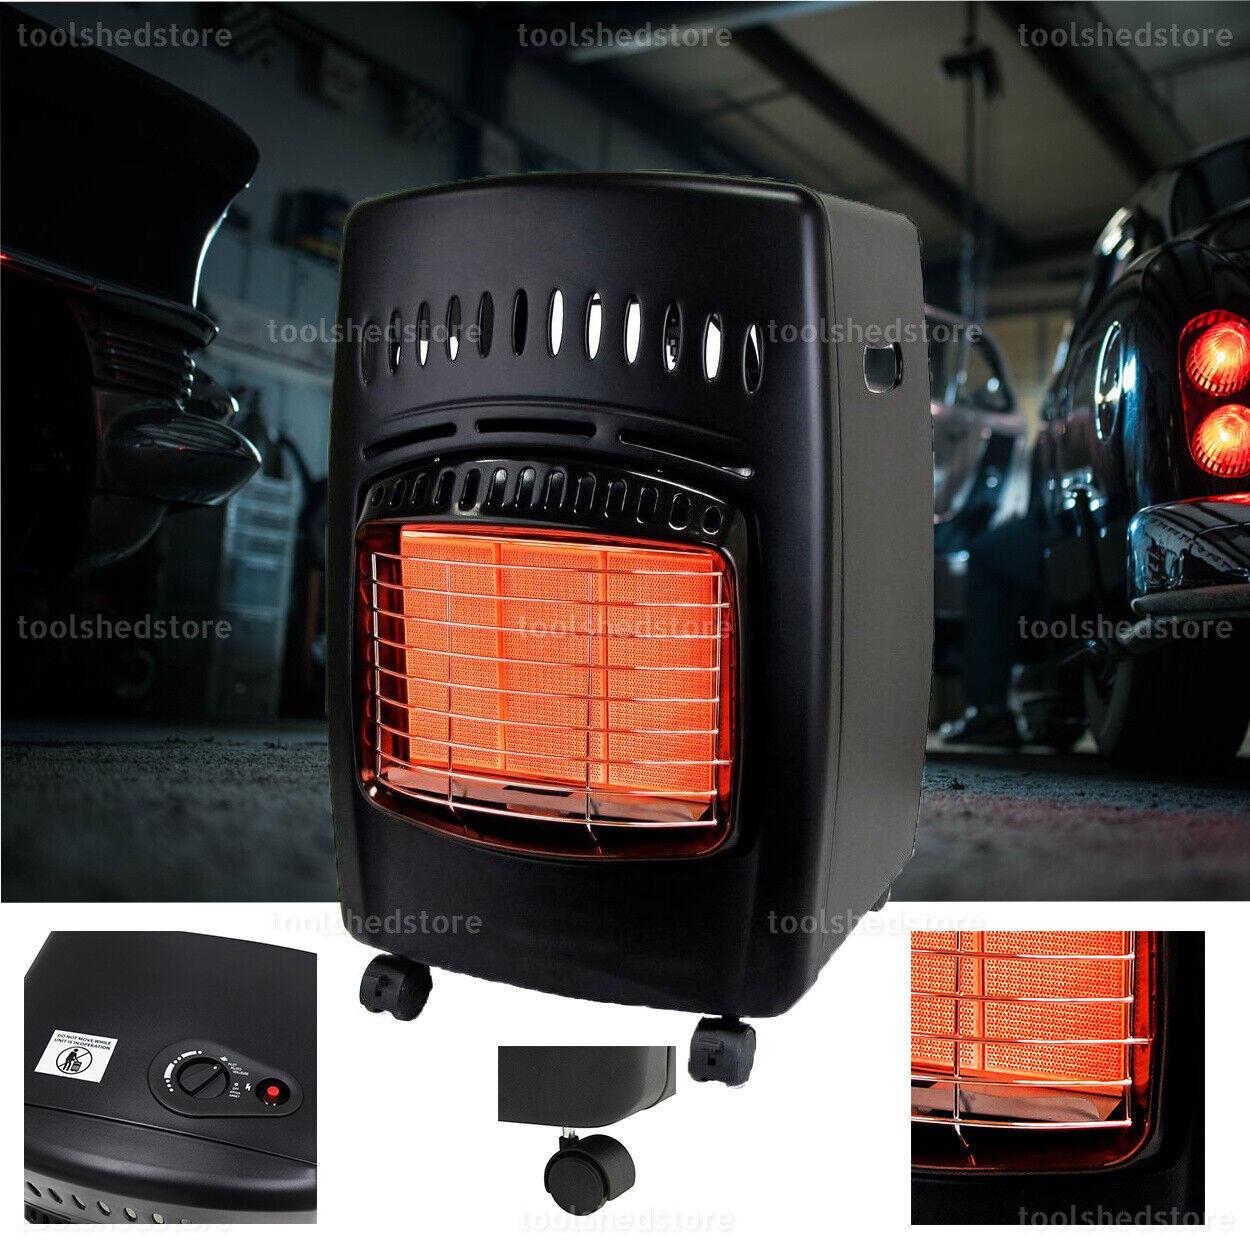 NEW Propane Gas Portable Heater 18000 BTU Indoor Locking Cas